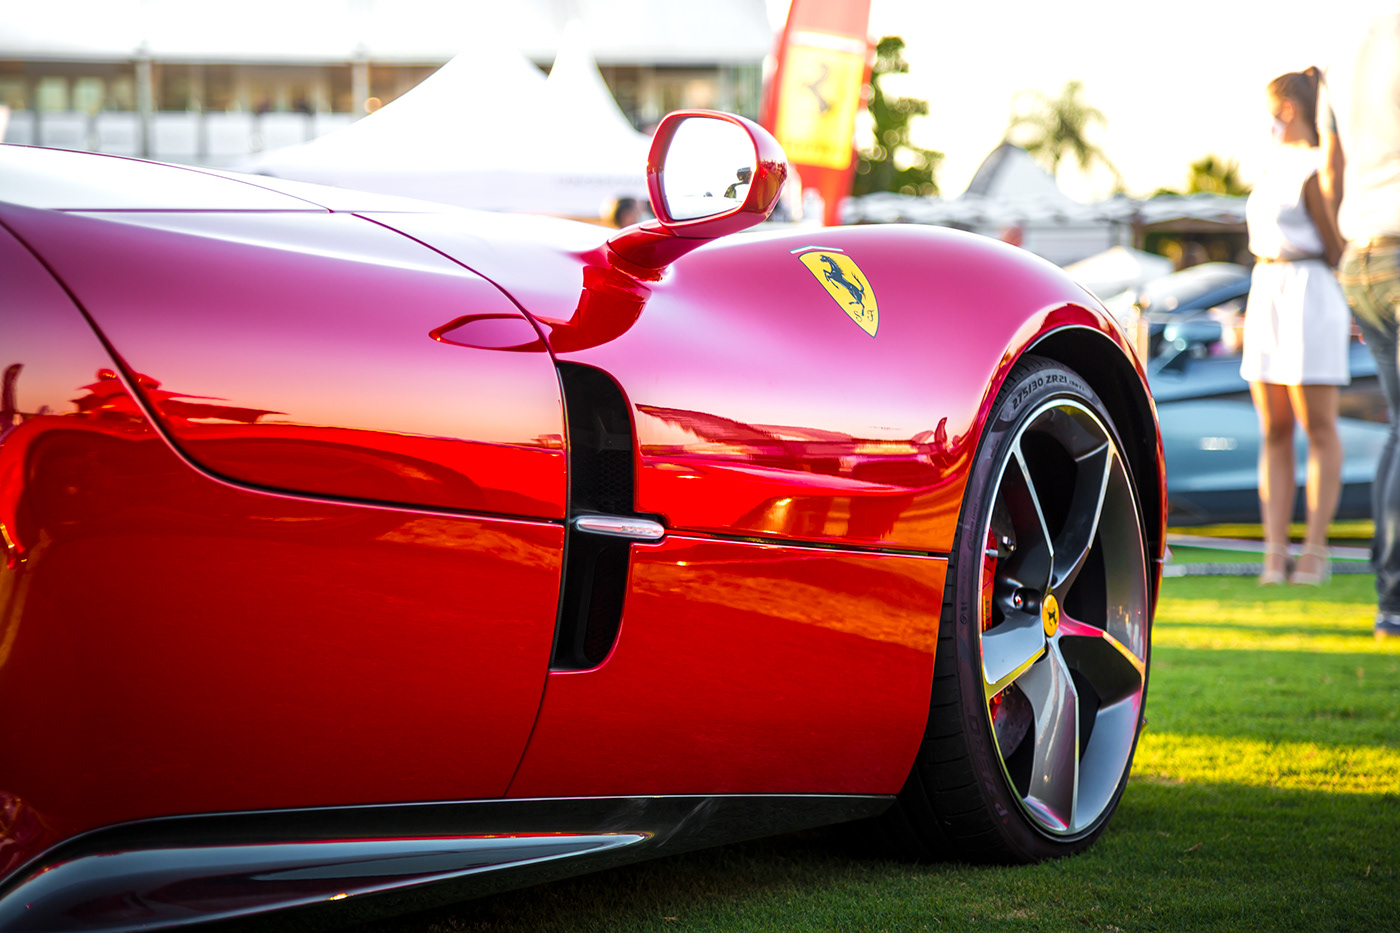 aston martin CARSHOW Event FERRARI hypercar Koenigsegg lamborghini quentin martinez spain supercar